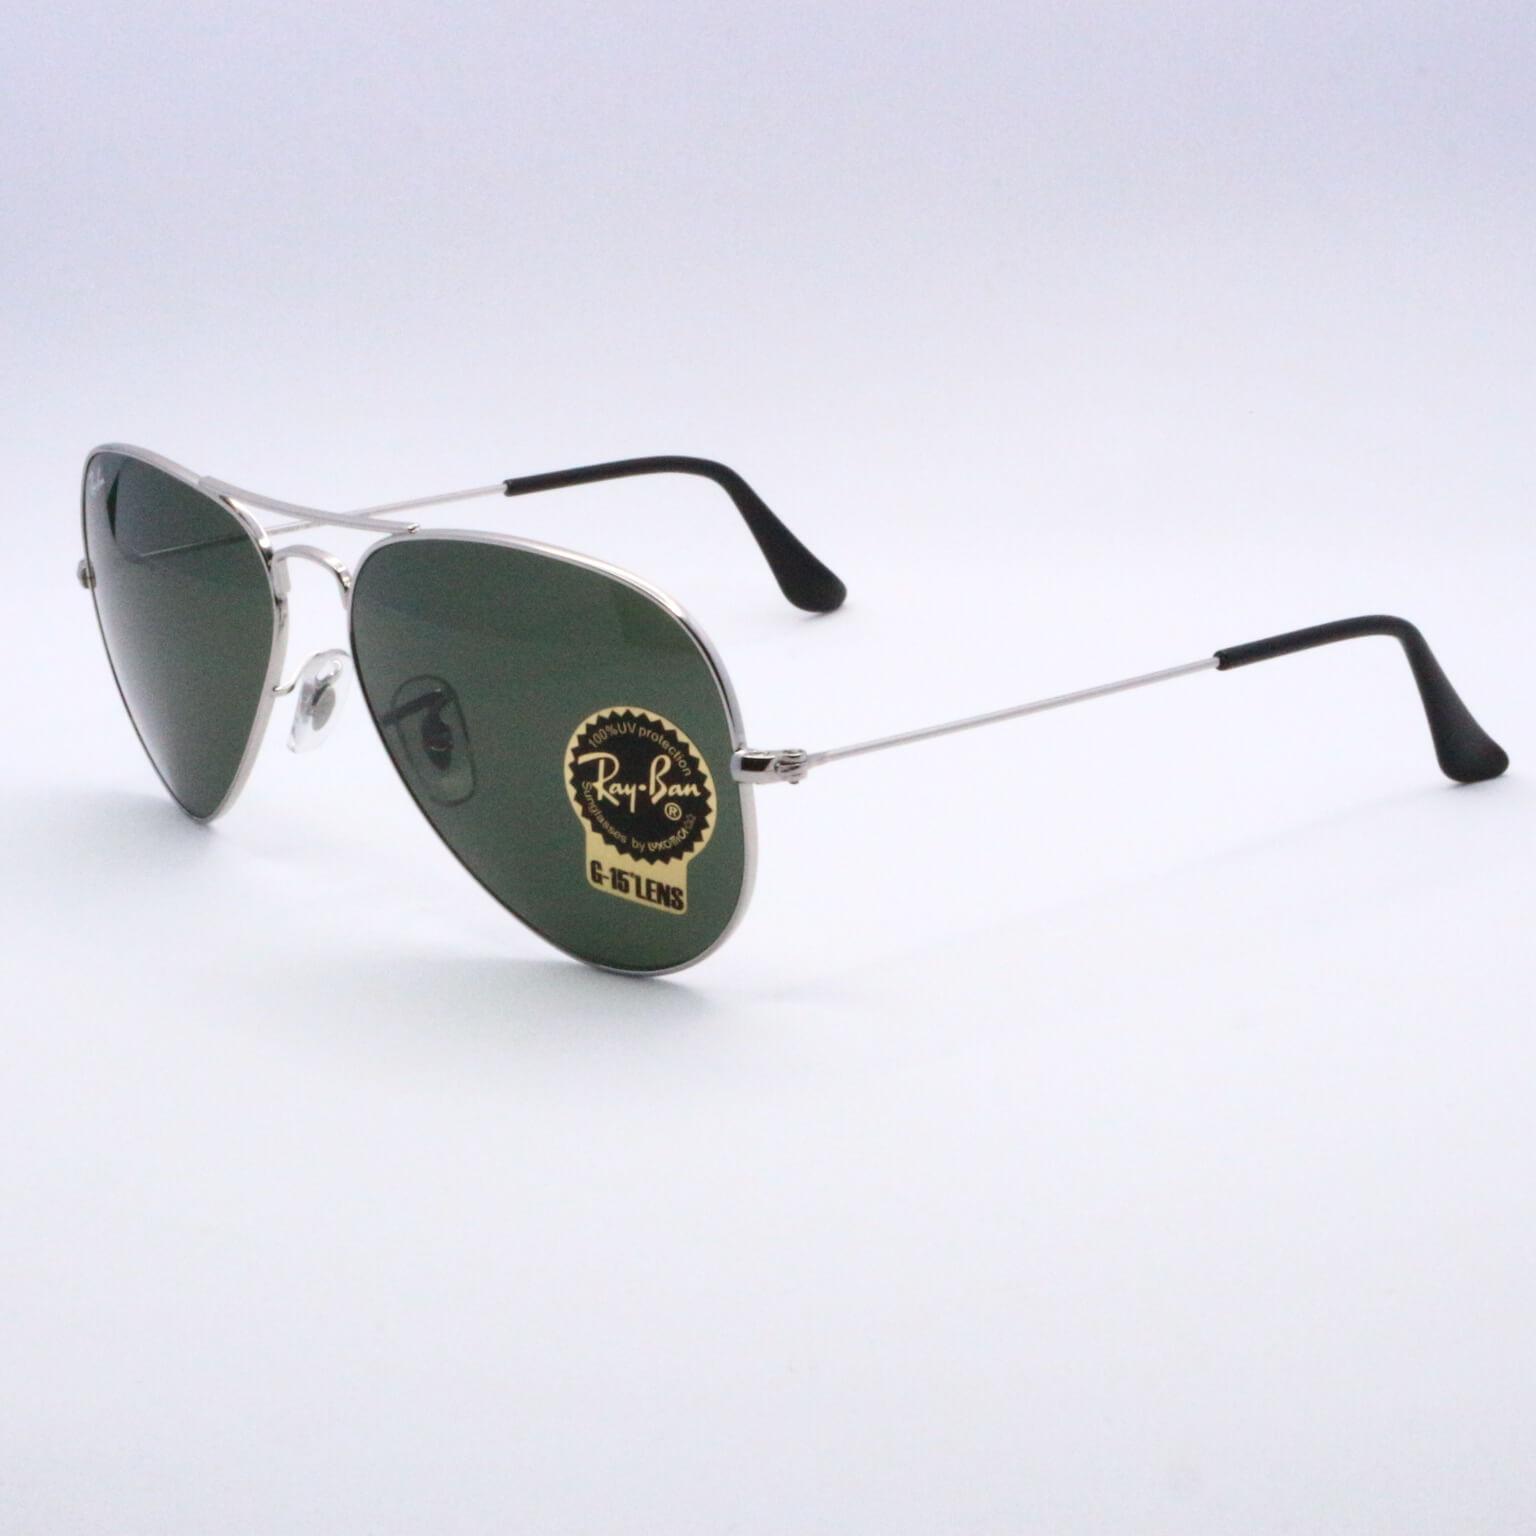 d99ae348a8 Γυαλιά ηλίου Ray-Ban 3025 003 58 58 Aviator ~ Οπτικά Eyelab